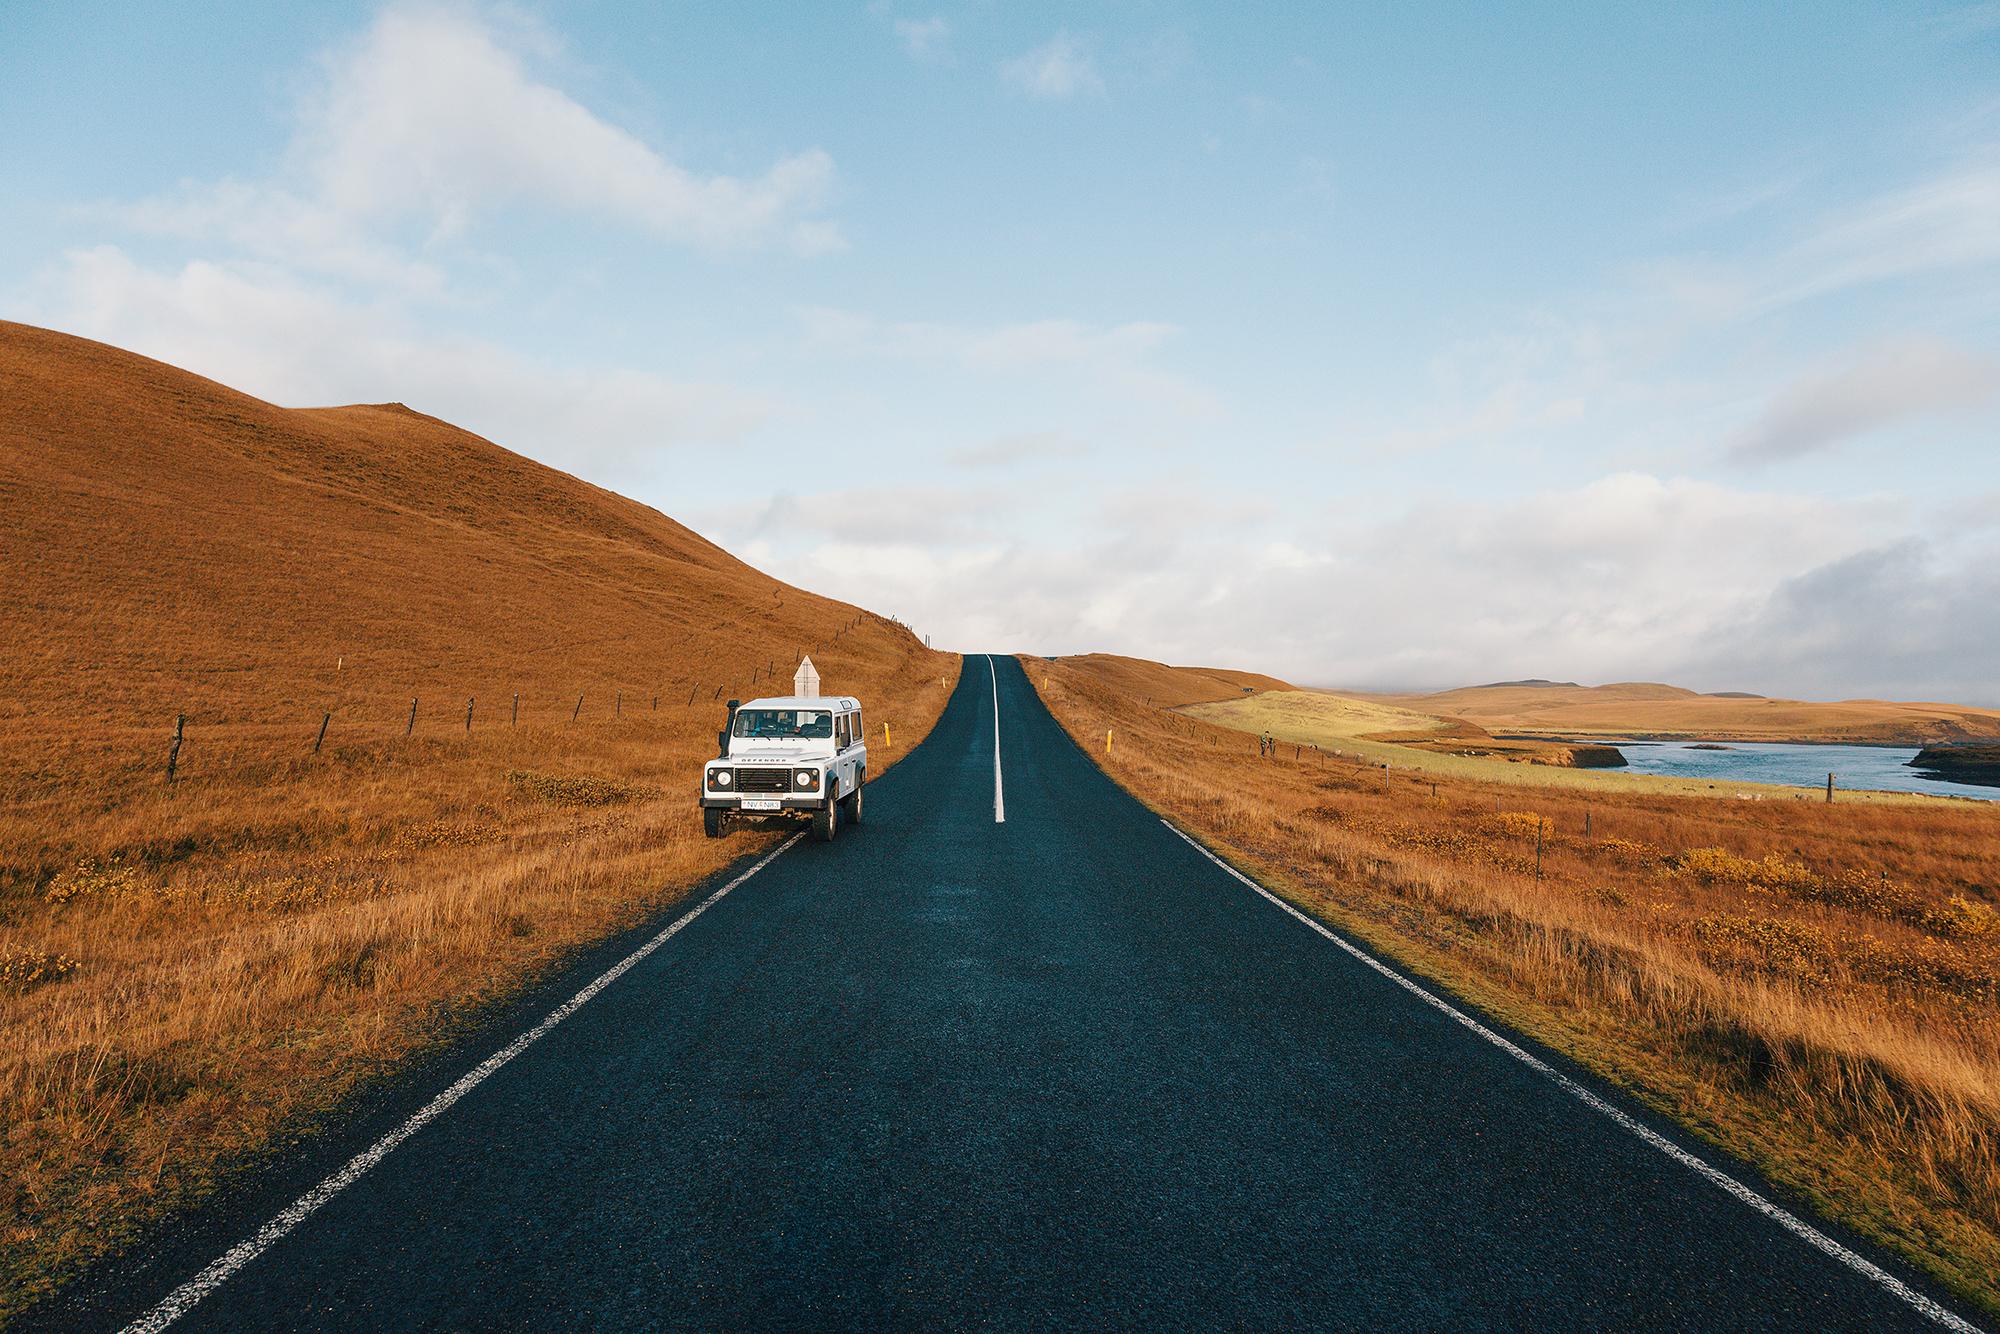 Iceland 08 - Rent A Car.jpg